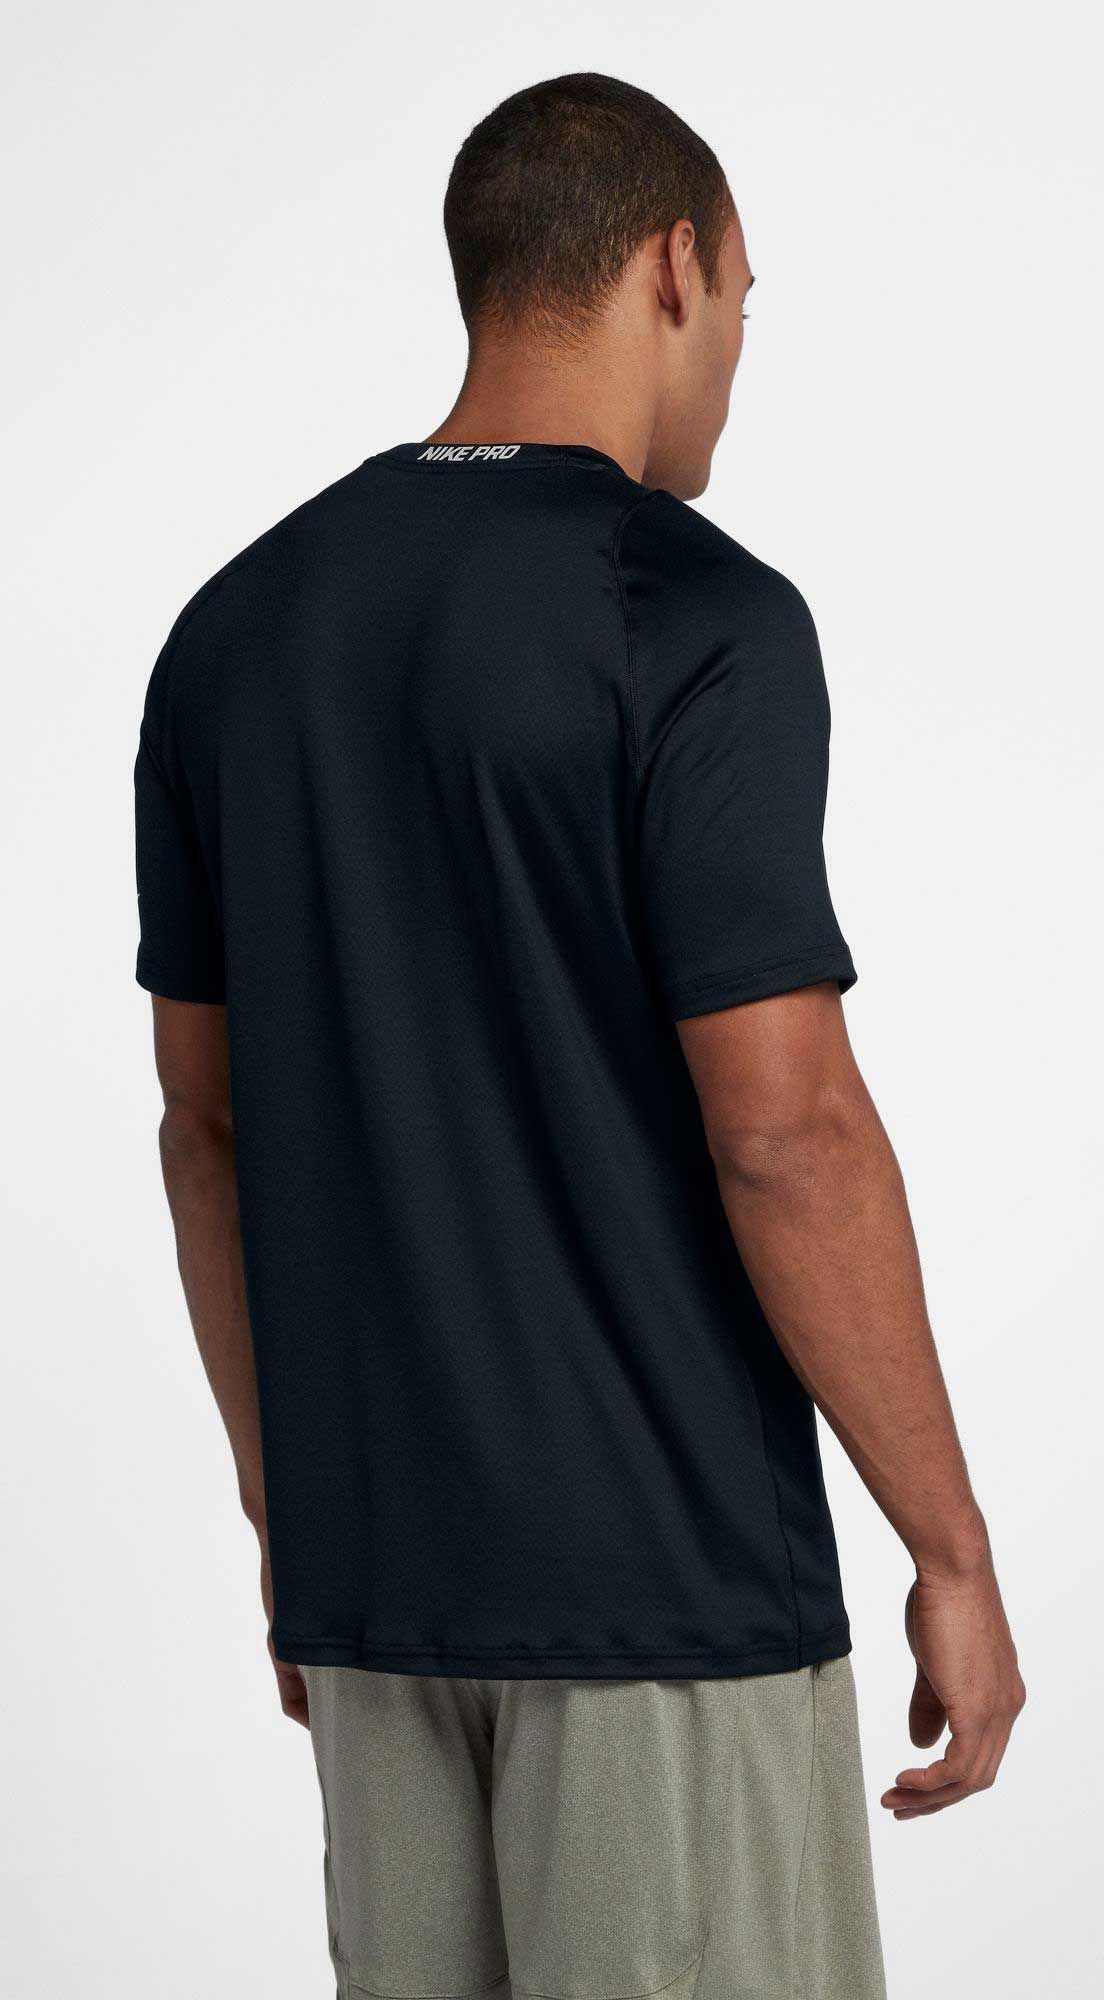 6fb450c3 Nike Pro Colorburst 2 T-shirt in Black for Men - Lyst